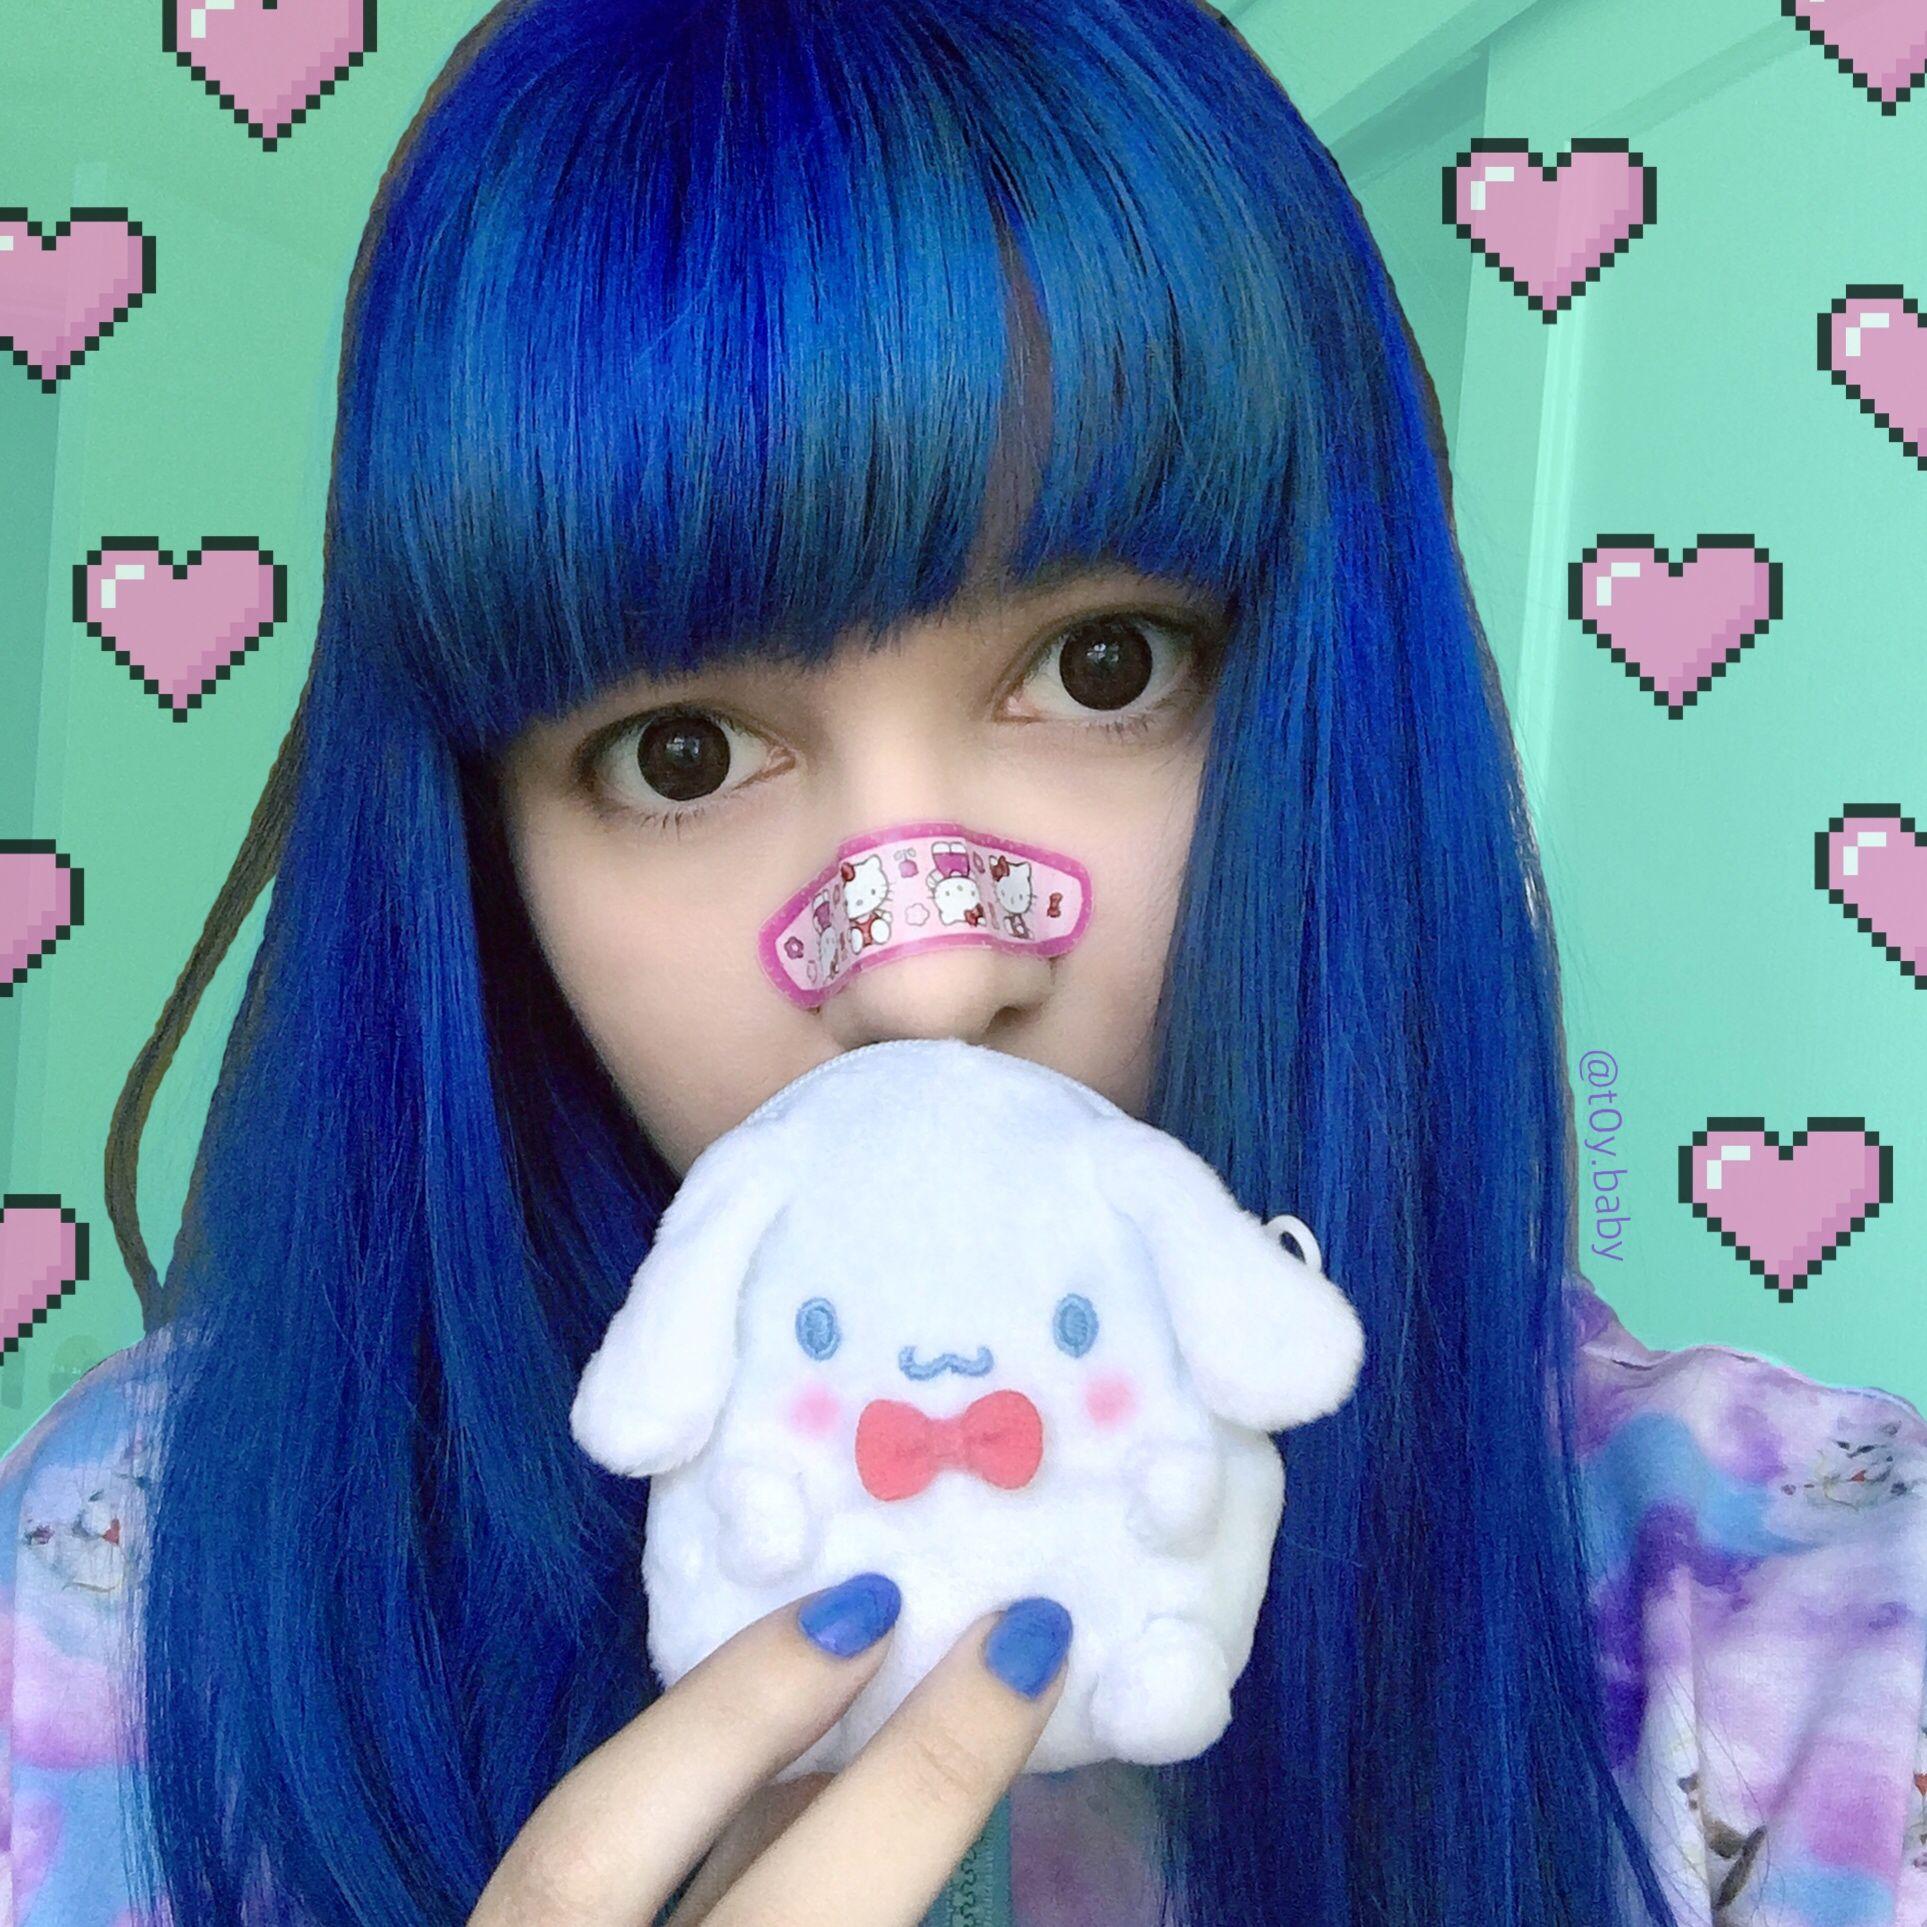 625744f6b ... #sanrio #hellokitty #bandaid #kawaii #cute #kawaiifashion  #kawaiiaesthetic #jfashion #harajukufashion #可愛い #パステル #pastel  #pastelaesthetic